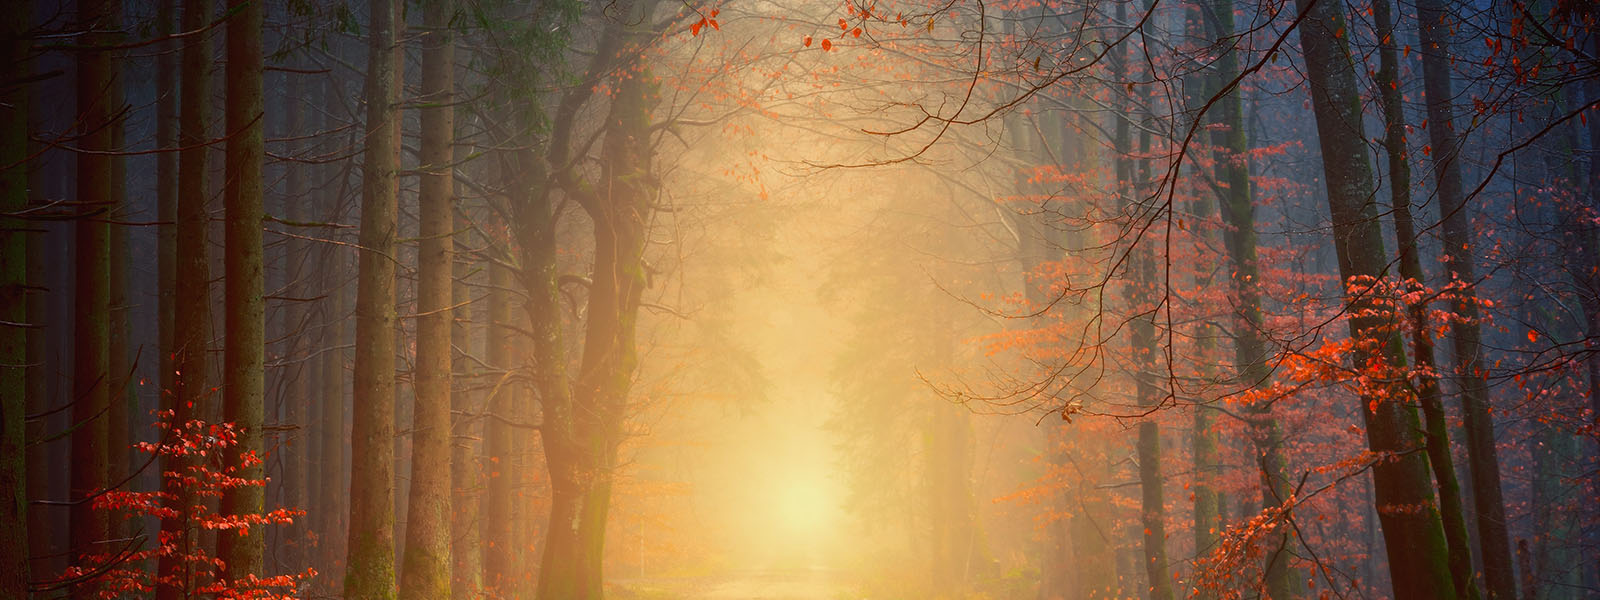 The Subtle Traps Of Spiritual Pride